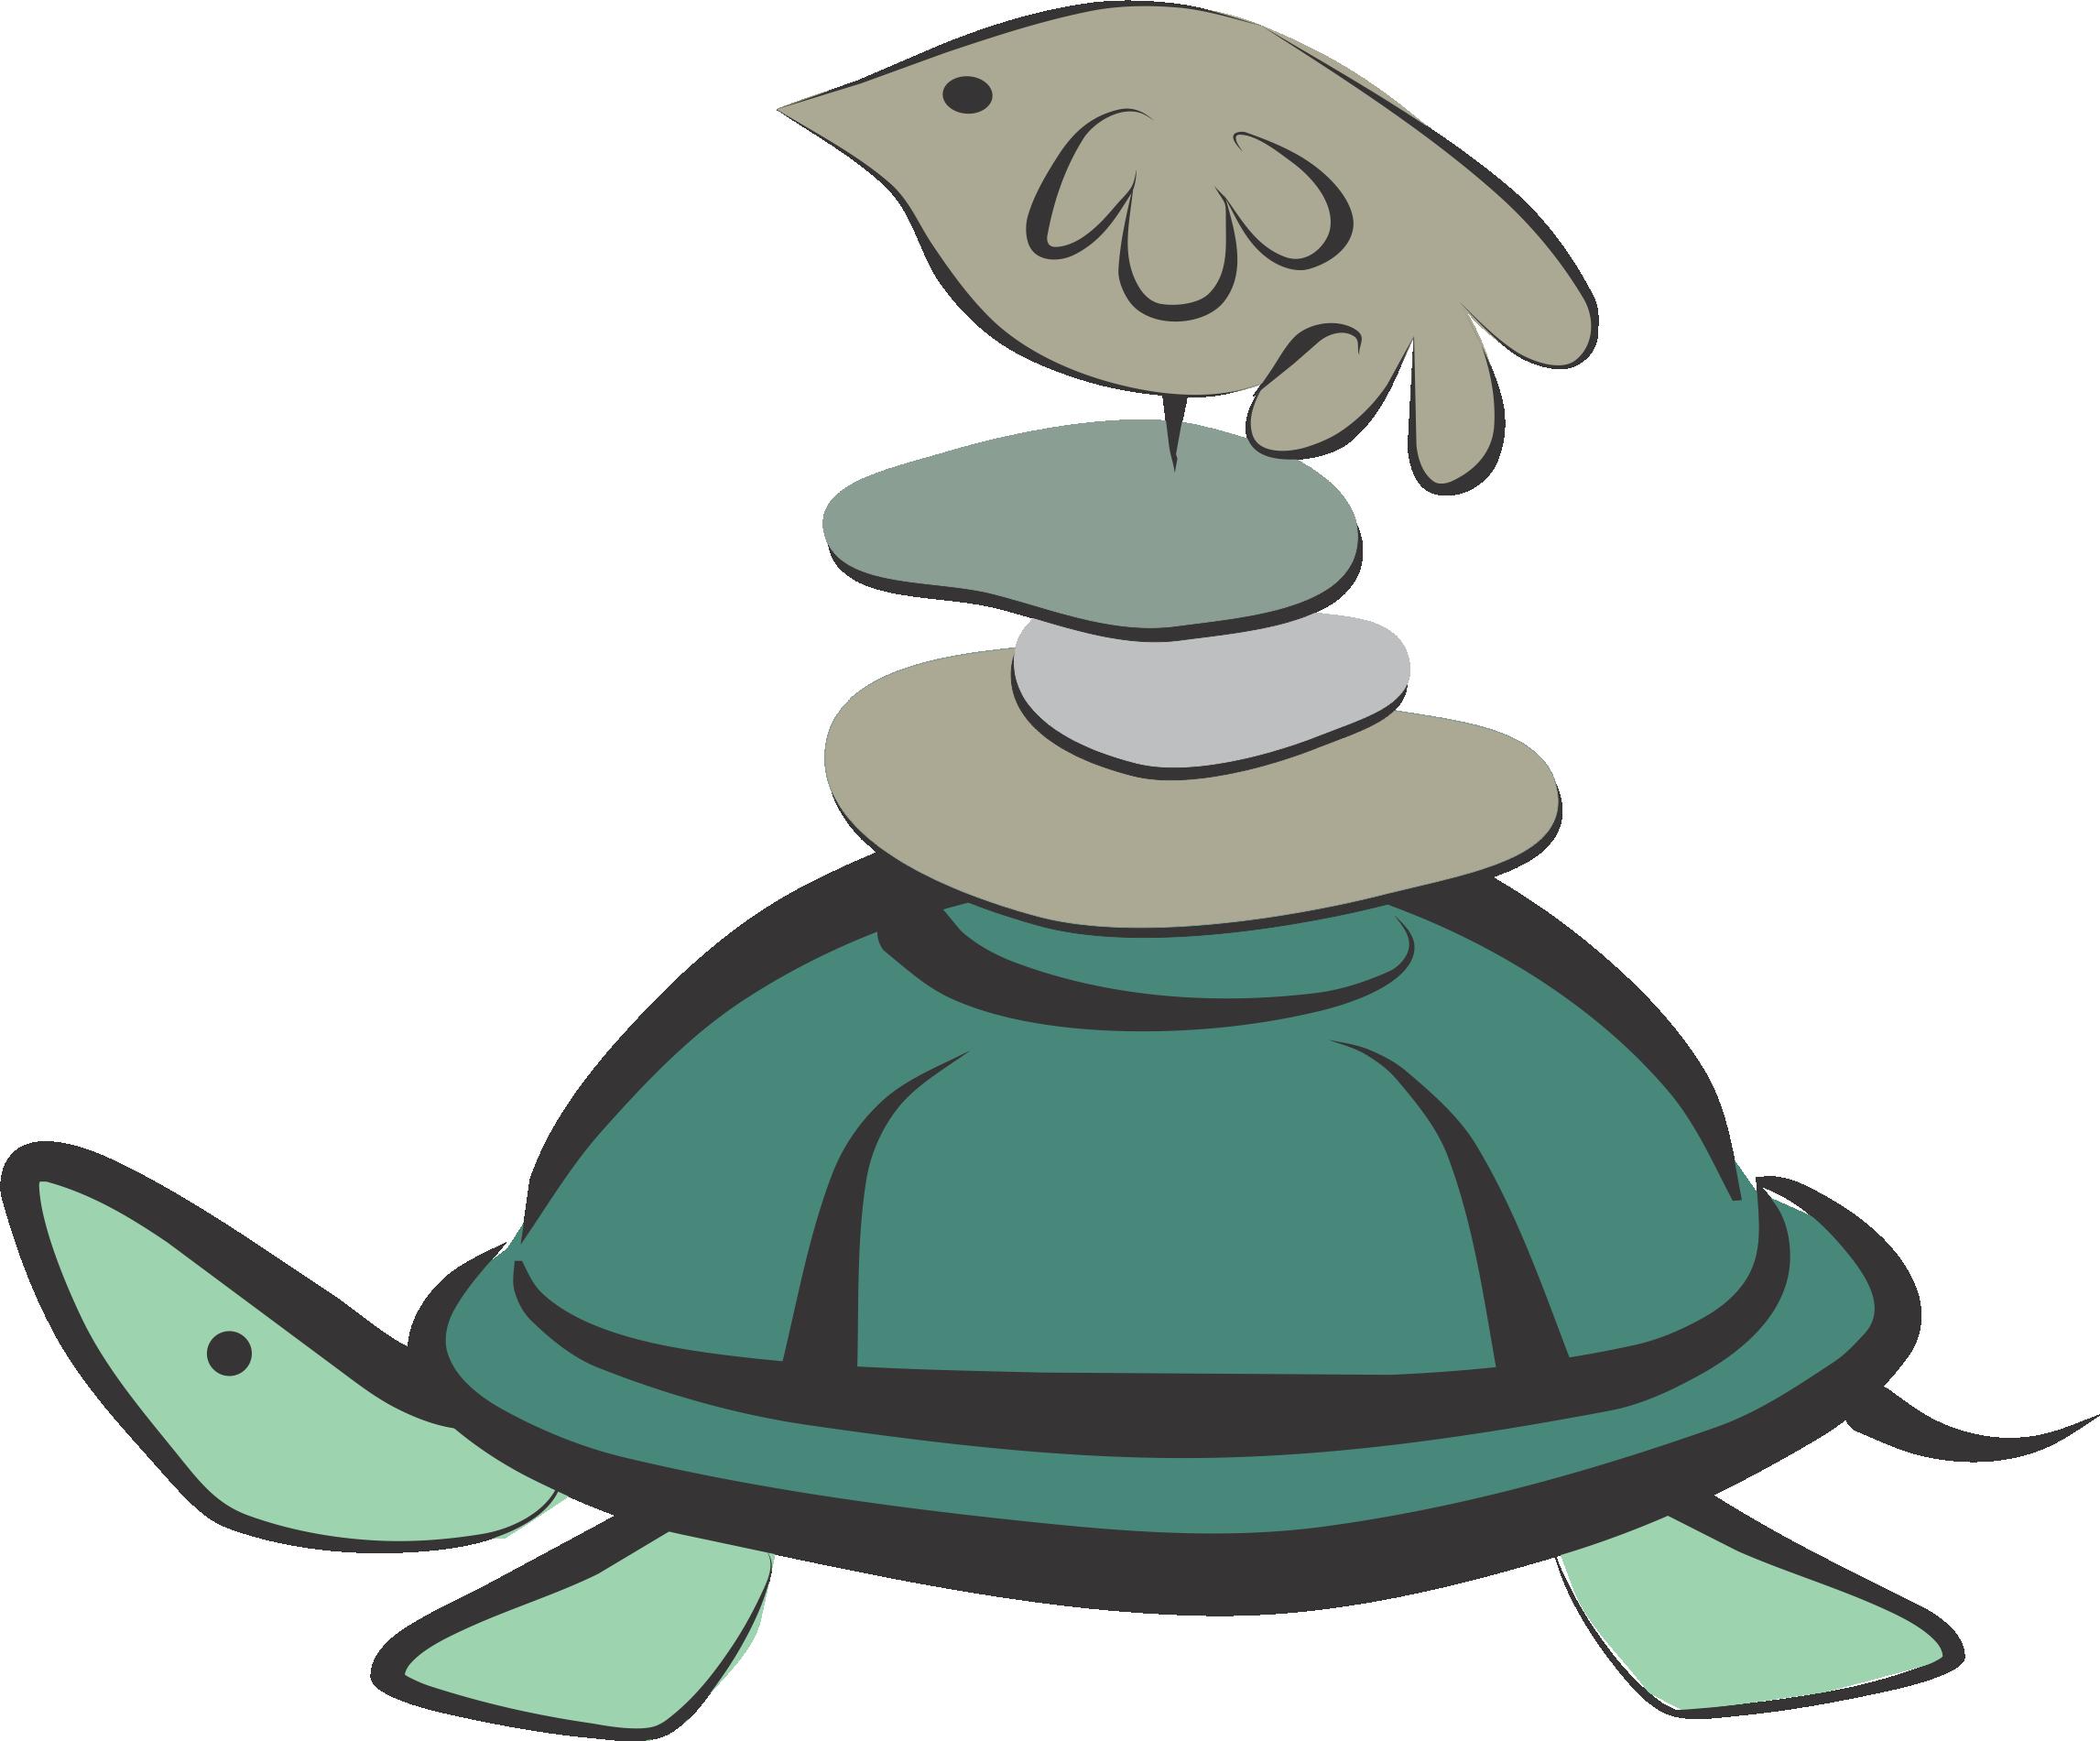 turt logo